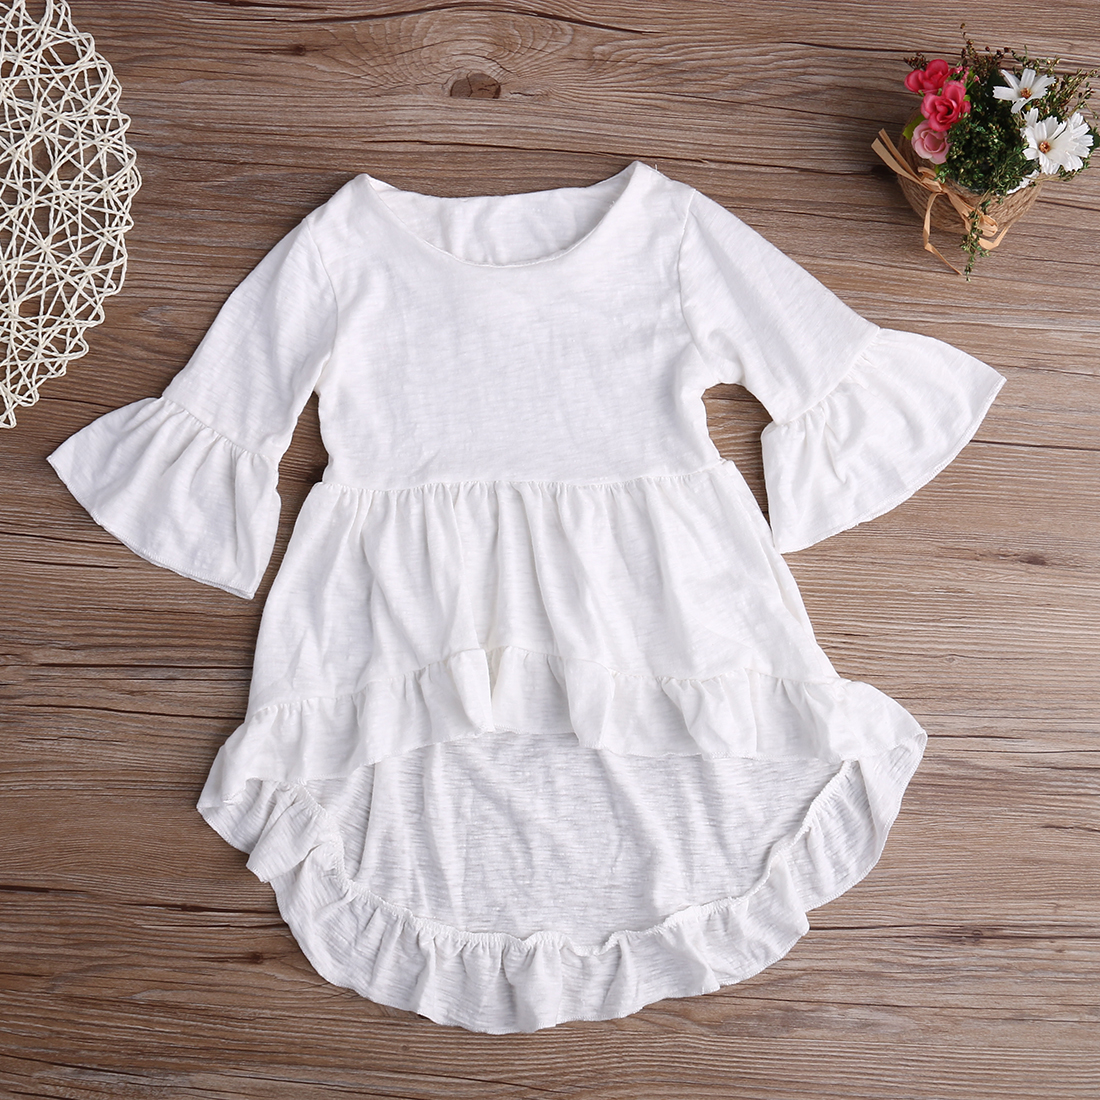 2016 Fancy Baby Girls Dress Frills Flare Sleeve Tops Shirt